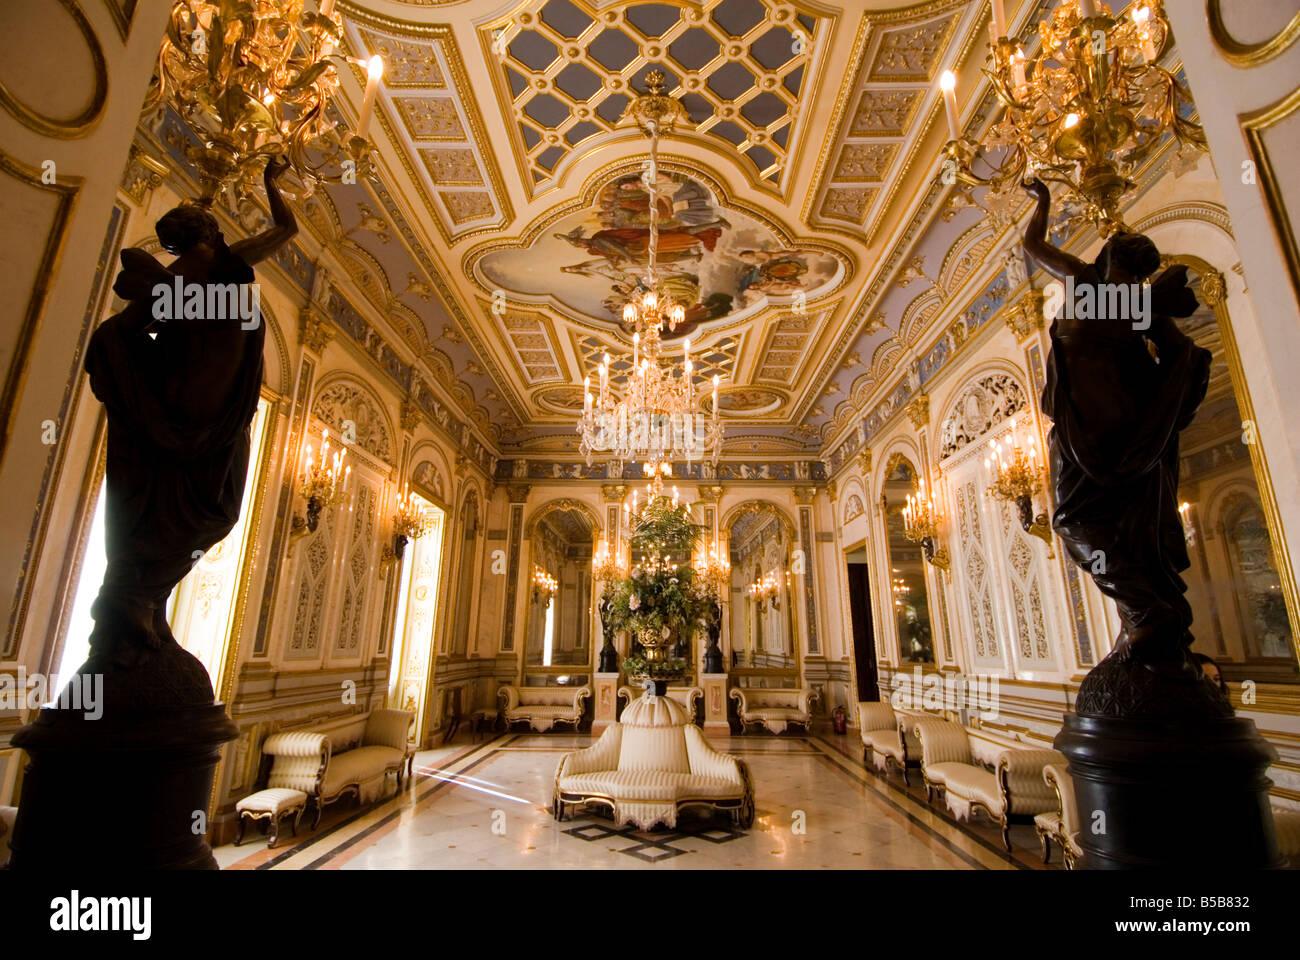 Ballroom Salon de Bail in the Palacio del Marques de Dos Aguas which houses the Ceramic museum. Valencia - Stock Image